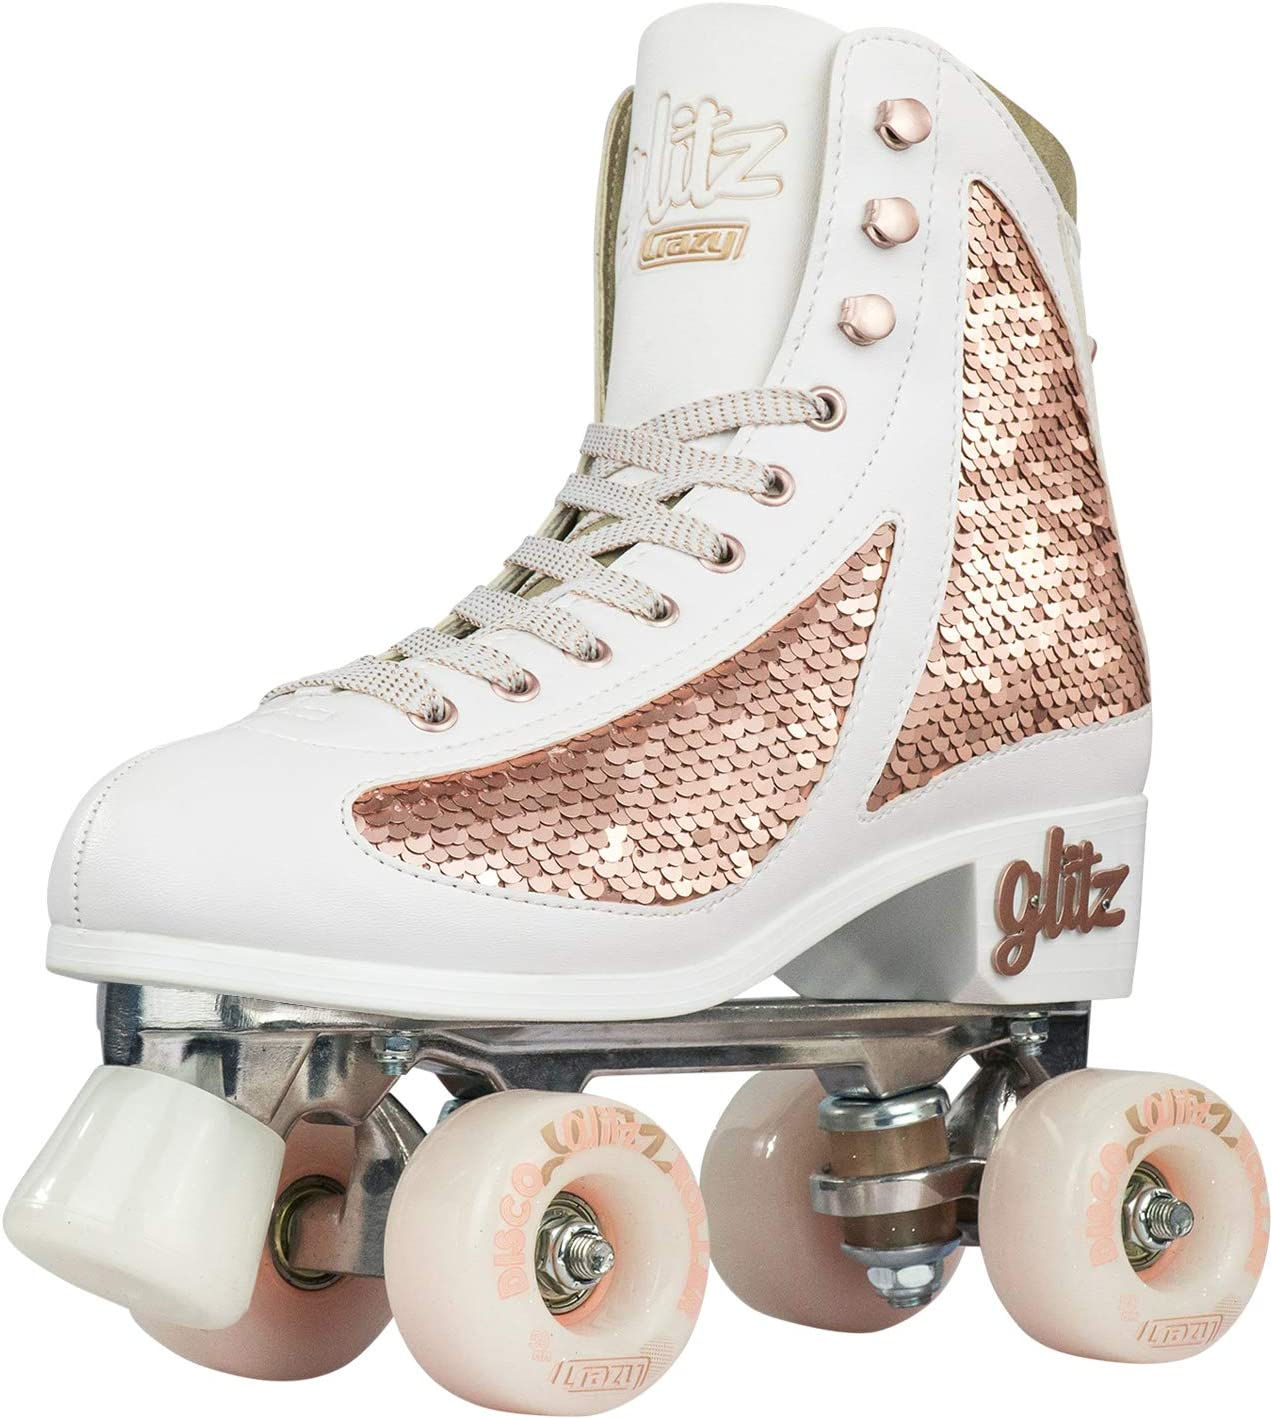 Crazy Skates Glitz Roller Skates for Women and Girls